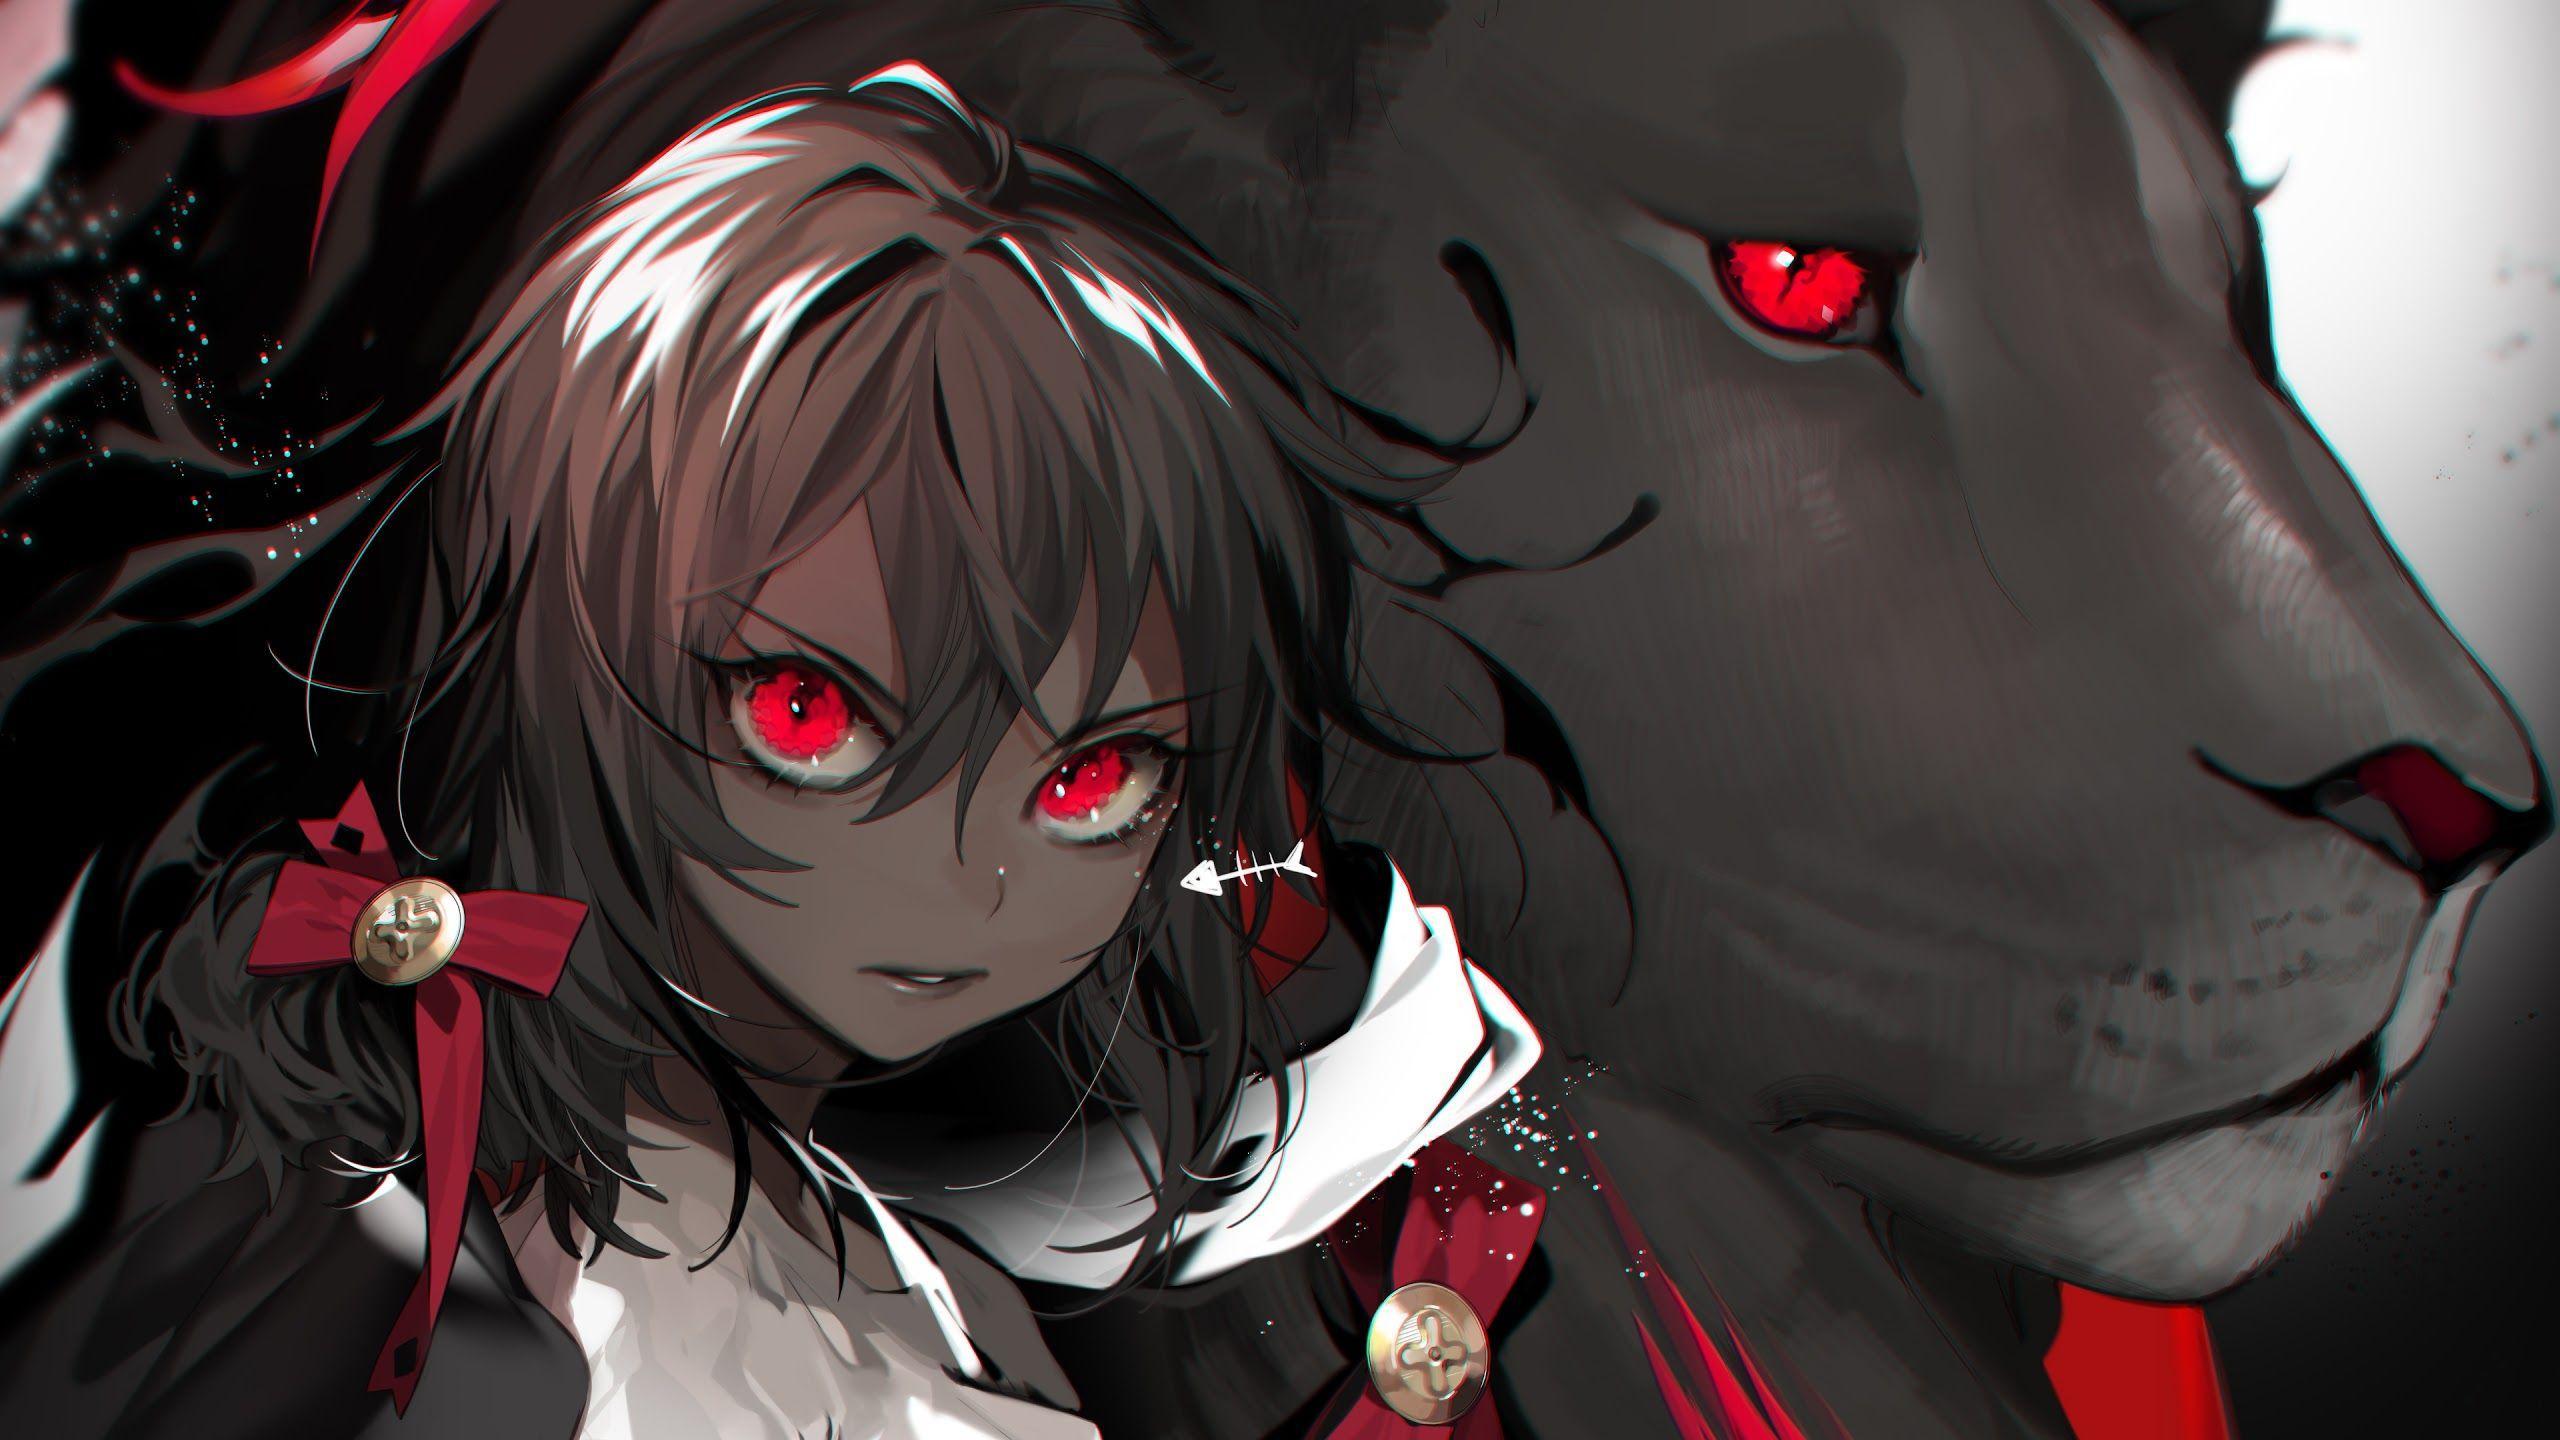 Red Anime Girl 4K Wallpapers - Top Free Red Anime Girl 4K ...